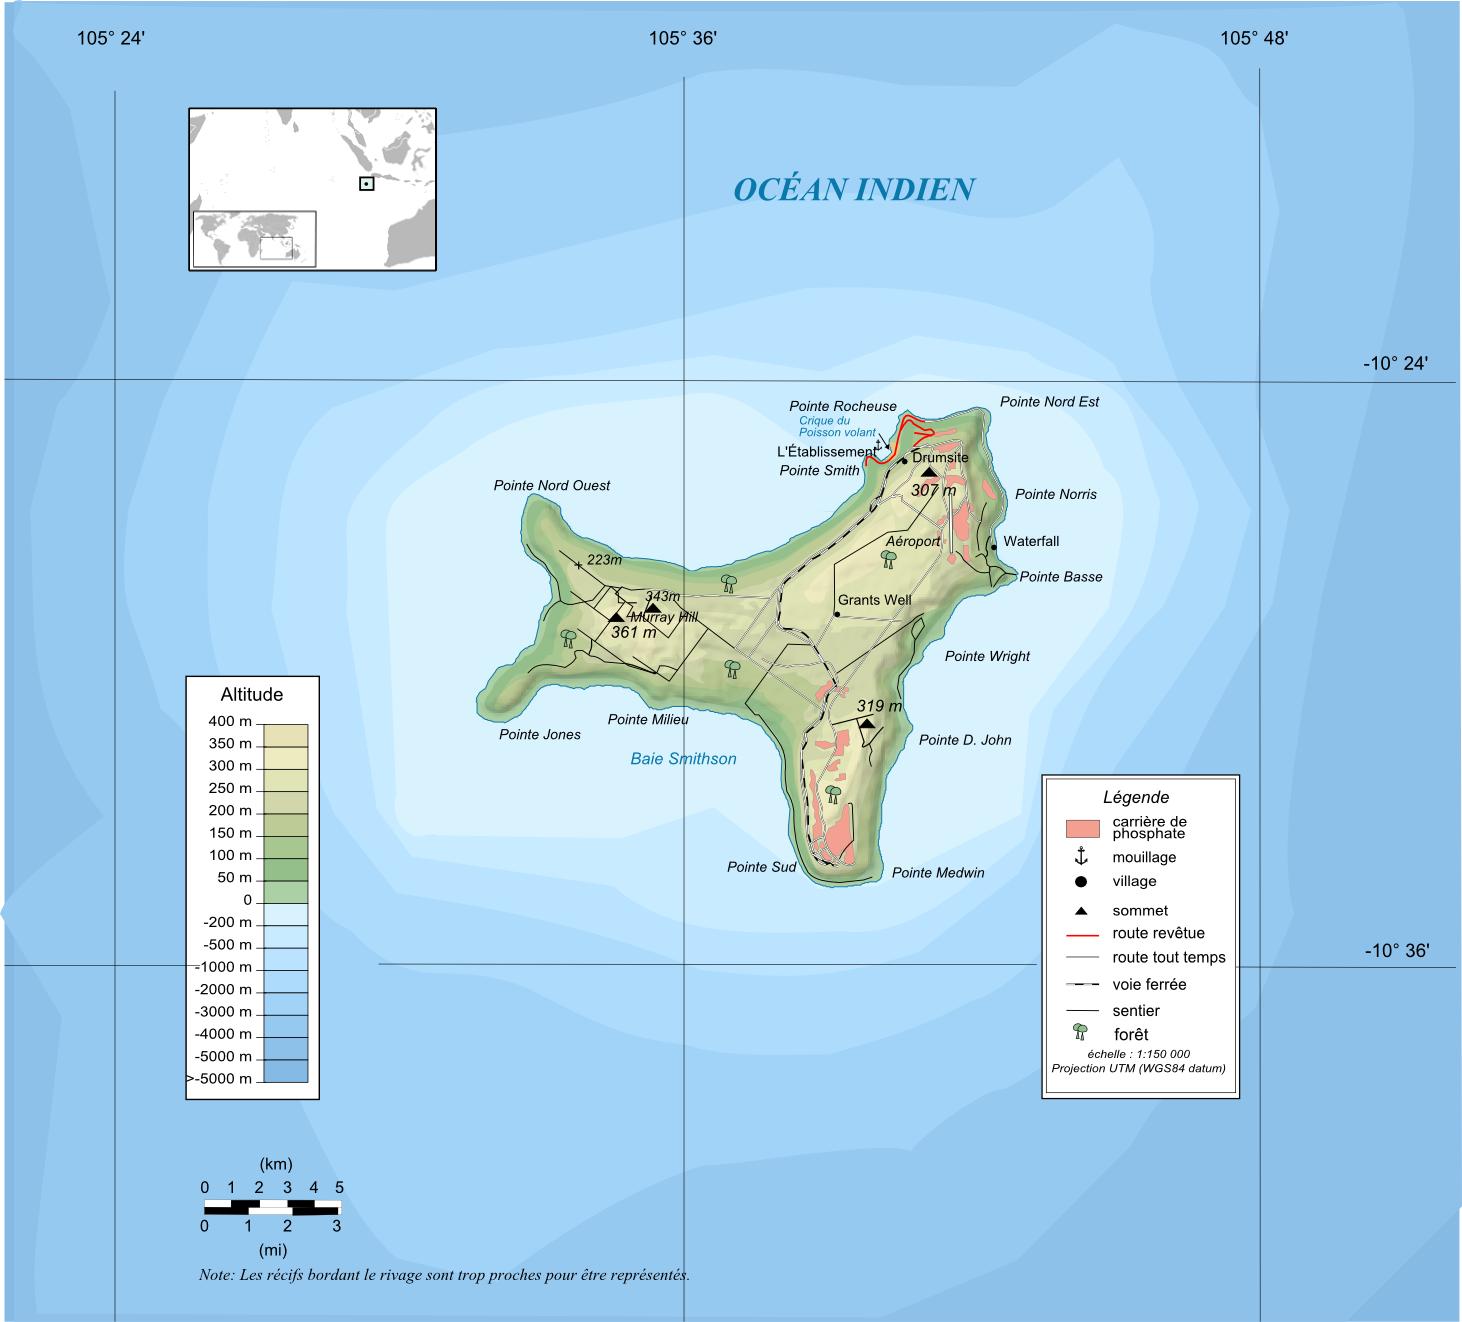 filechristmas island australia 76 frpng